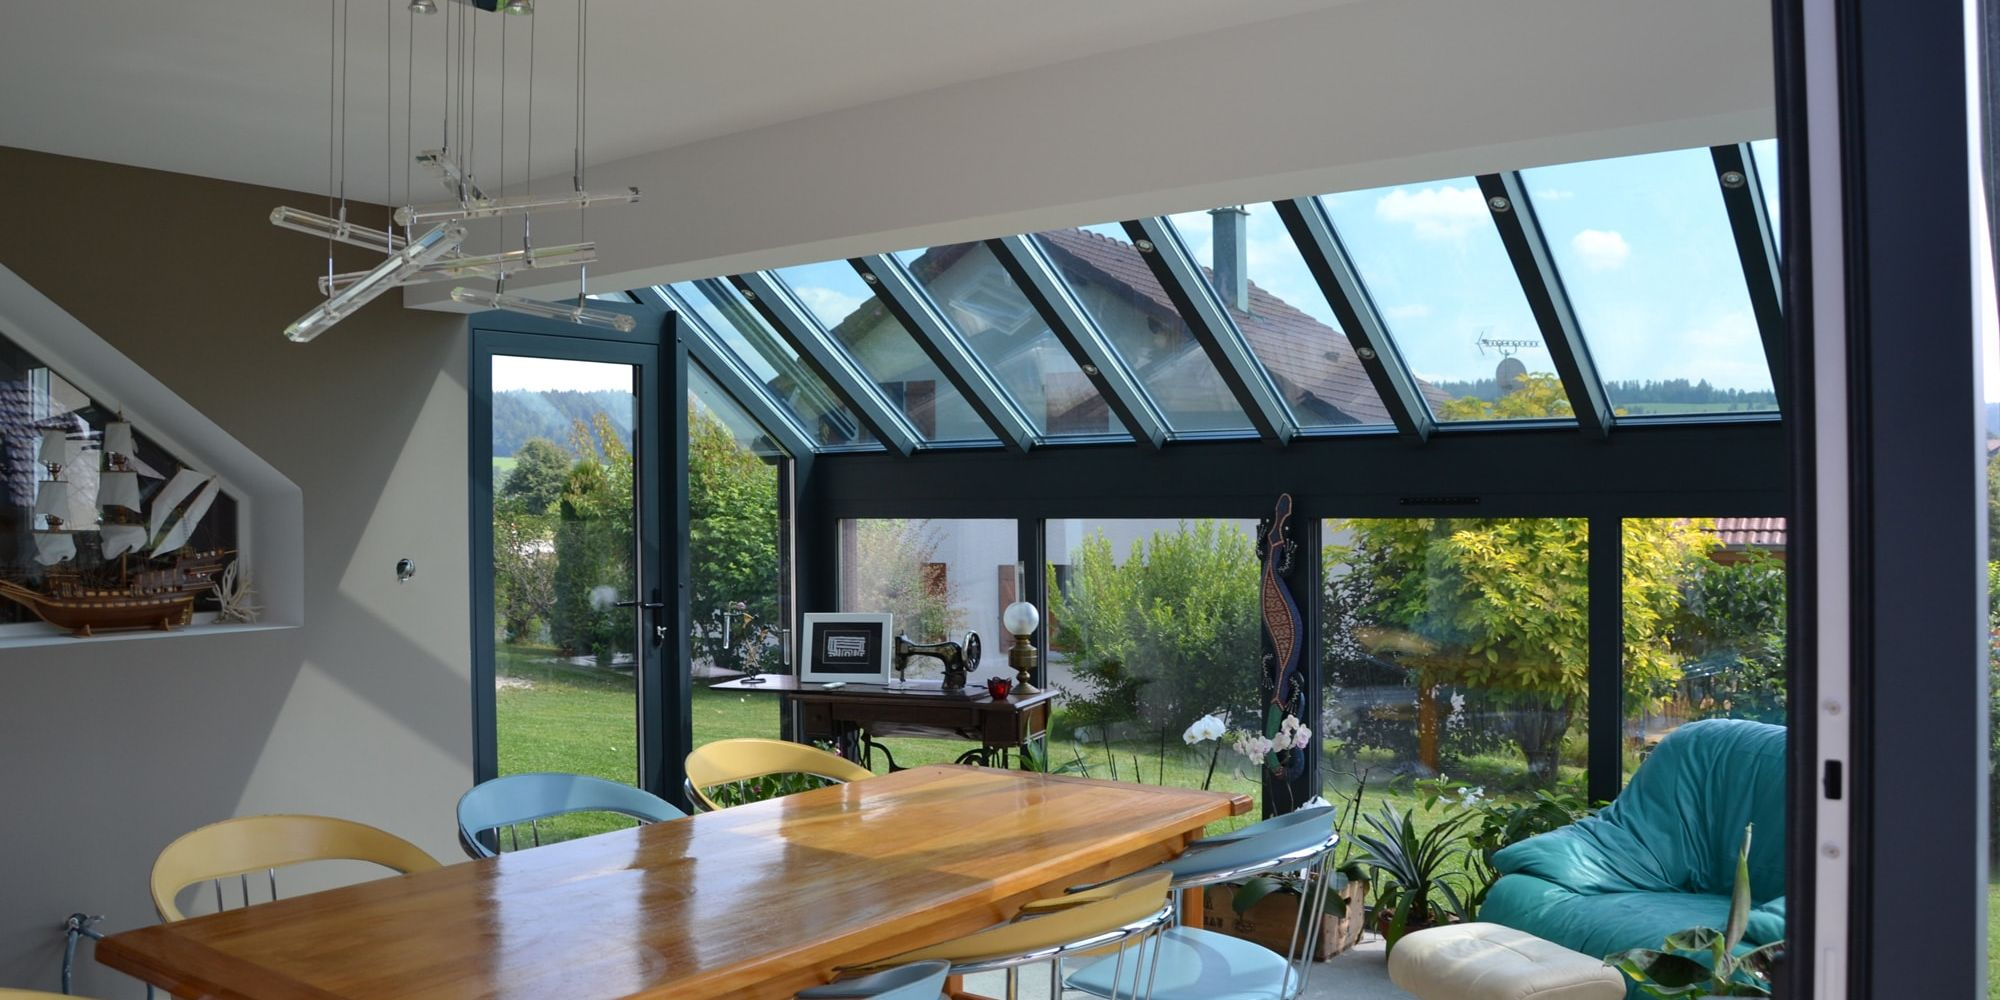 fabricant de veranda dans le doubs. Black Bedroom Furniture Sets. Home Design Ideas